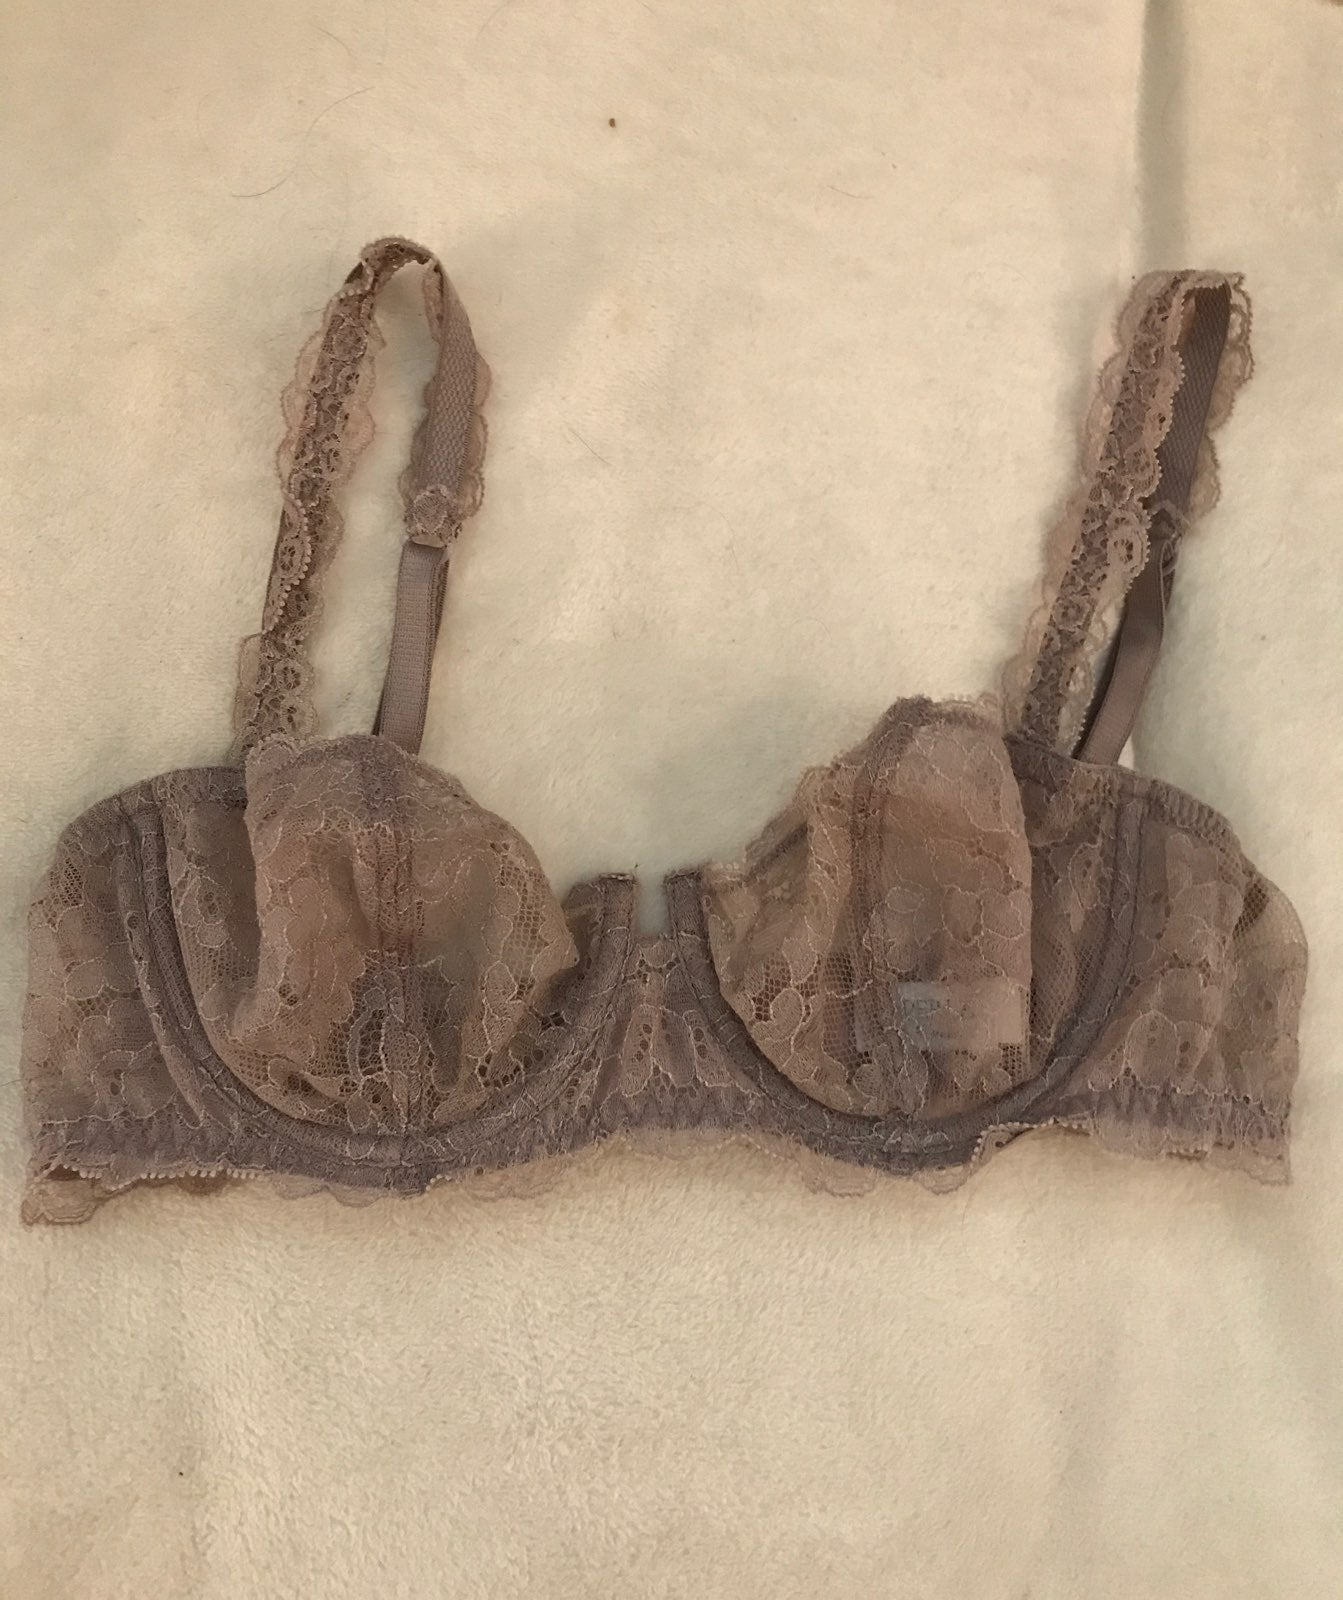 Laperla taupe lace bra 34B